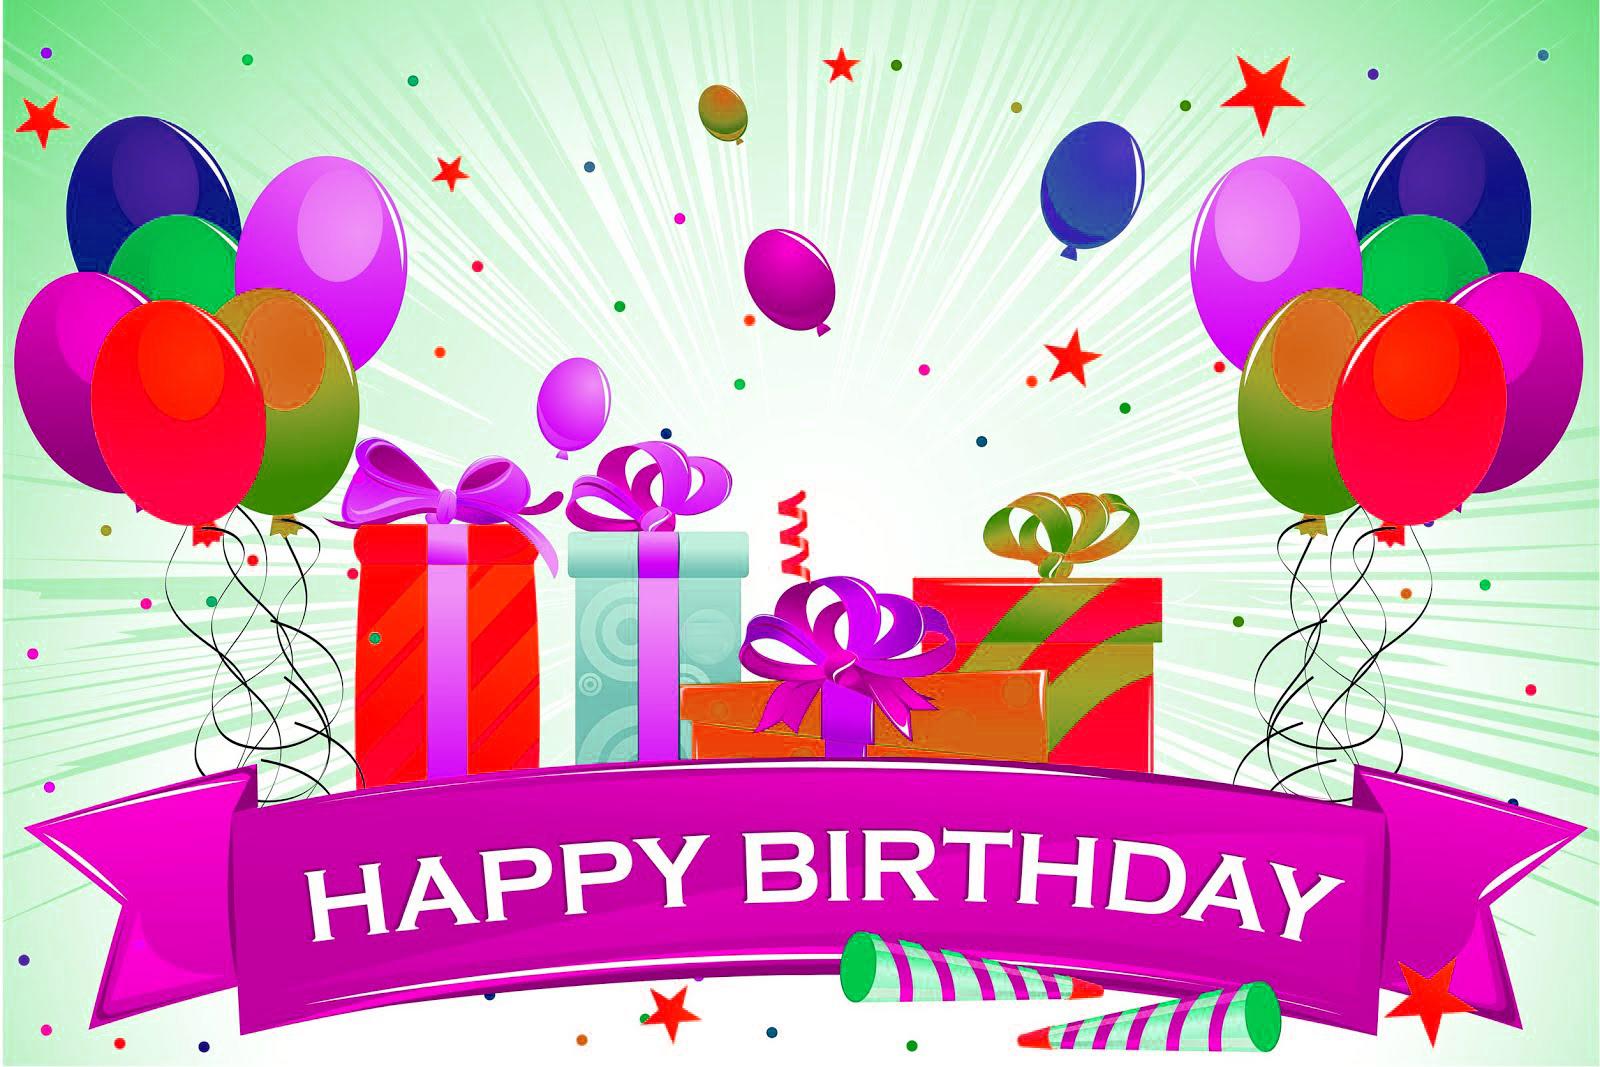 Download Birthday Card Under Fontanacountryinn Com - Happy